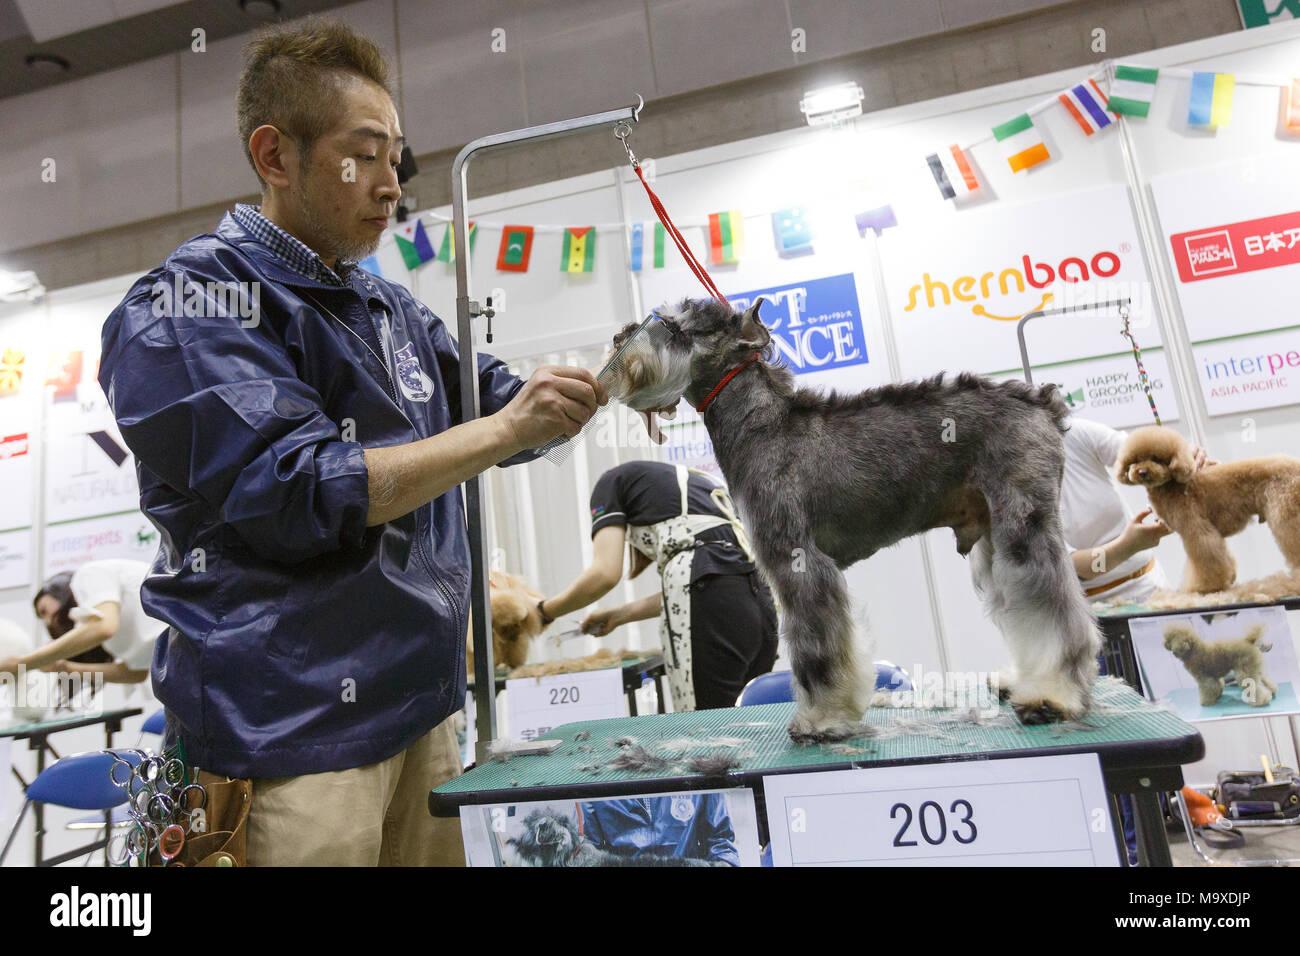 Leonid Yarmolnik dogs bitten by a 2-year-old girl 29.06.2010 45